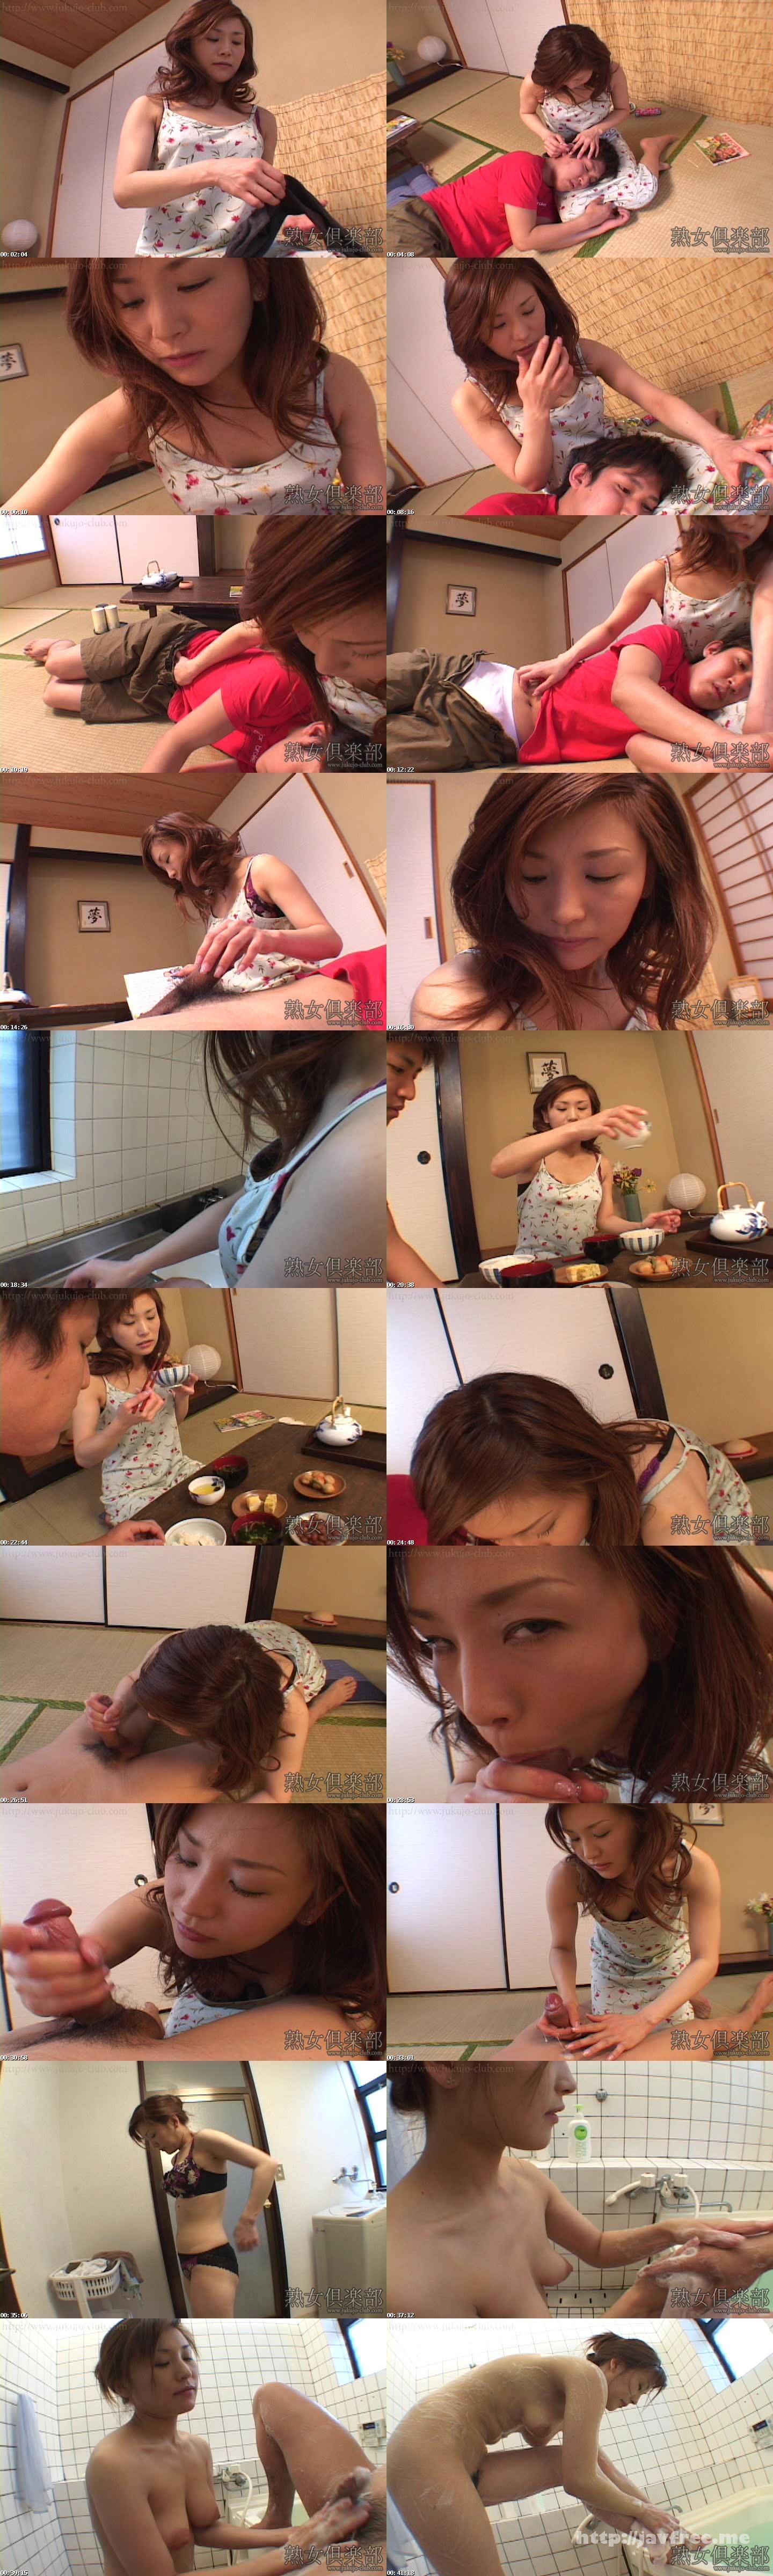 Jukujo-club 5200 藤沢翔子 家族を愛して何が悪い?! 第1話 - 熟女倶楽部 - image jukujoclub-5200 on https://javfree.me